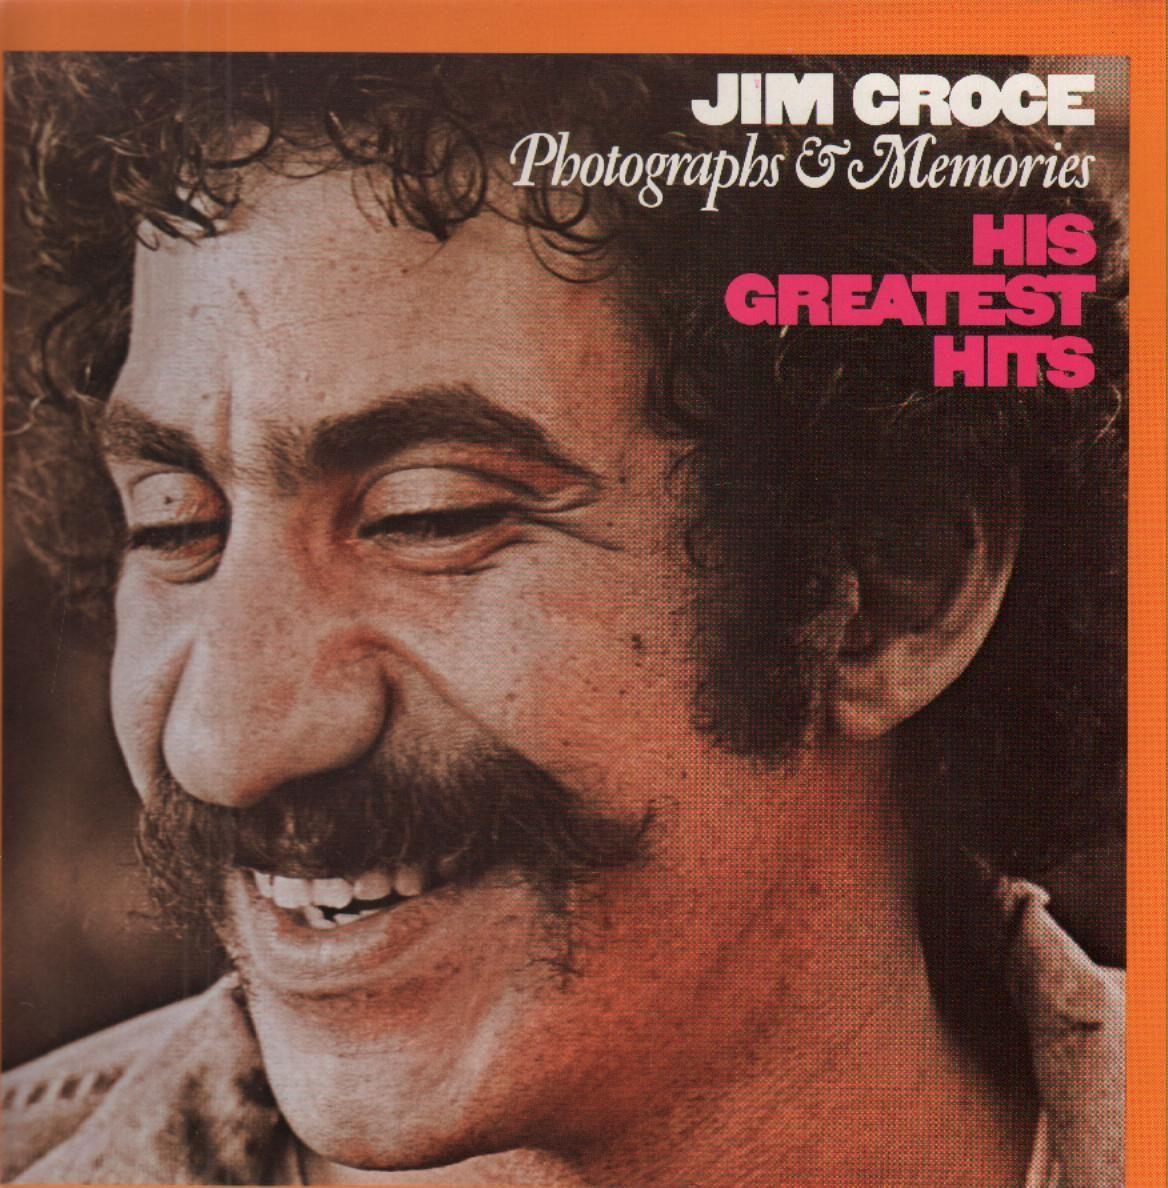 Croce jim and - memories photographs